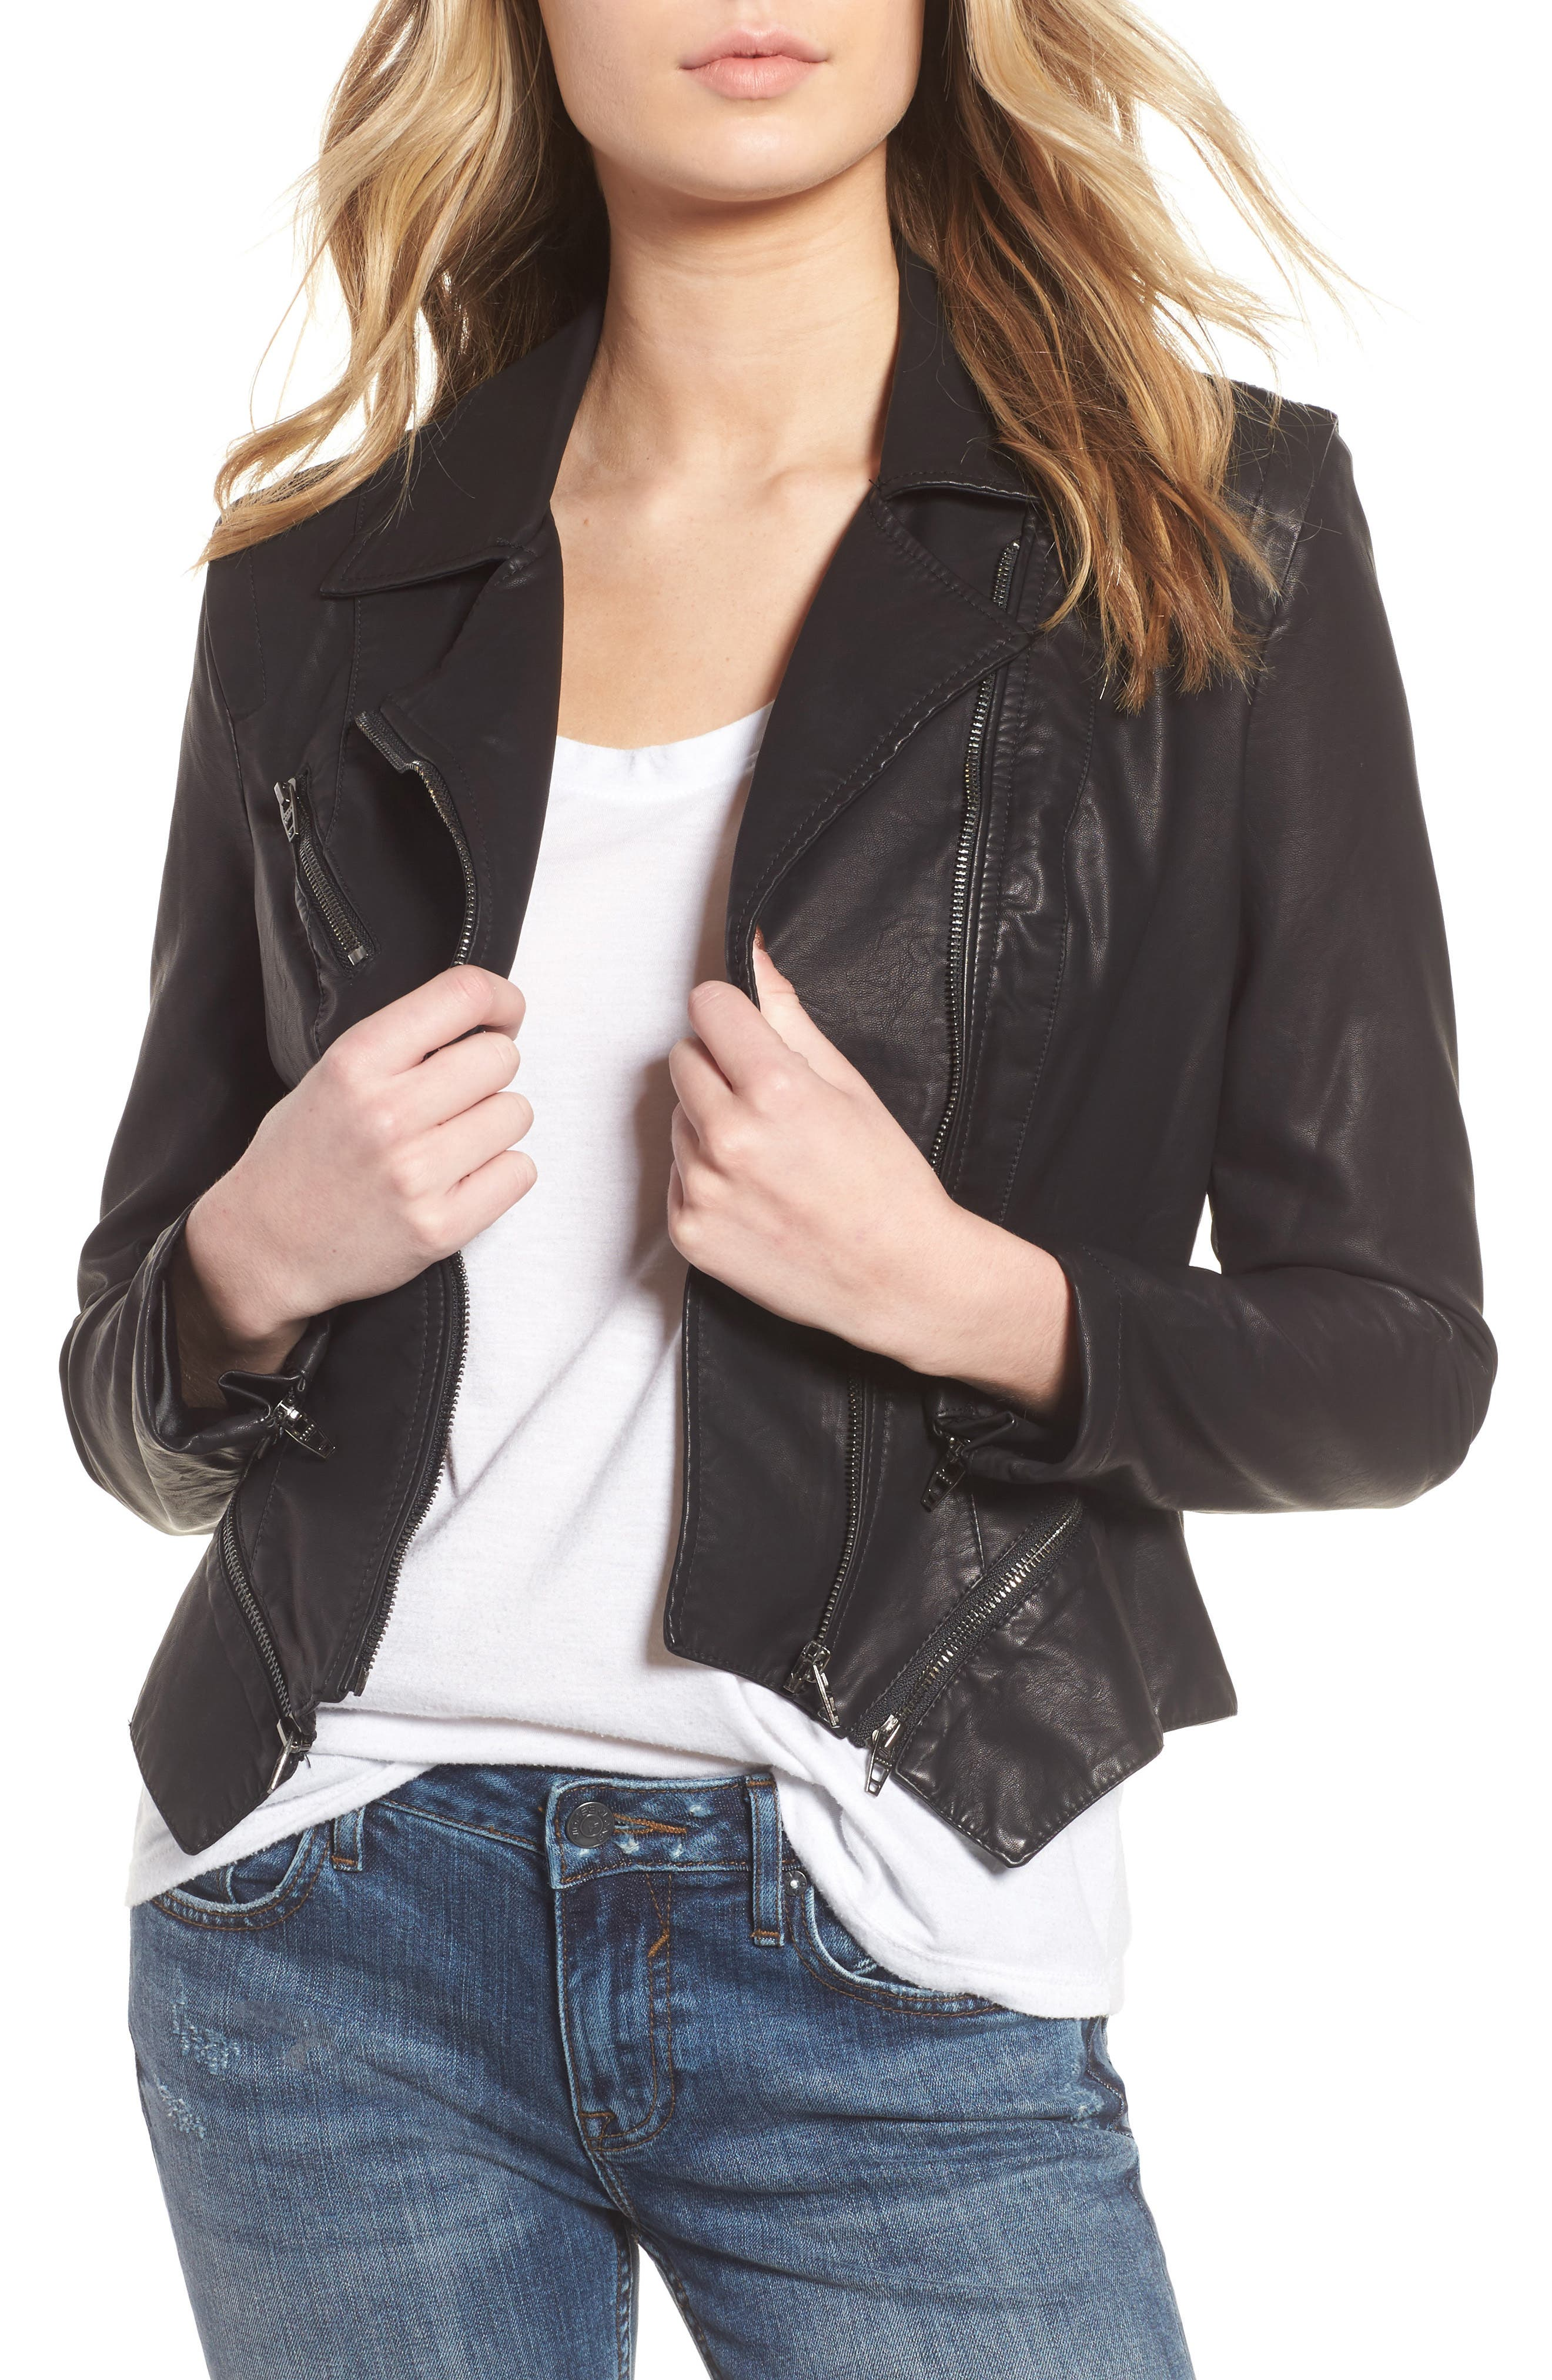 BLANKNYC, Faux Leather Moto Jacket, Main thumbnail 1, color, BLACK